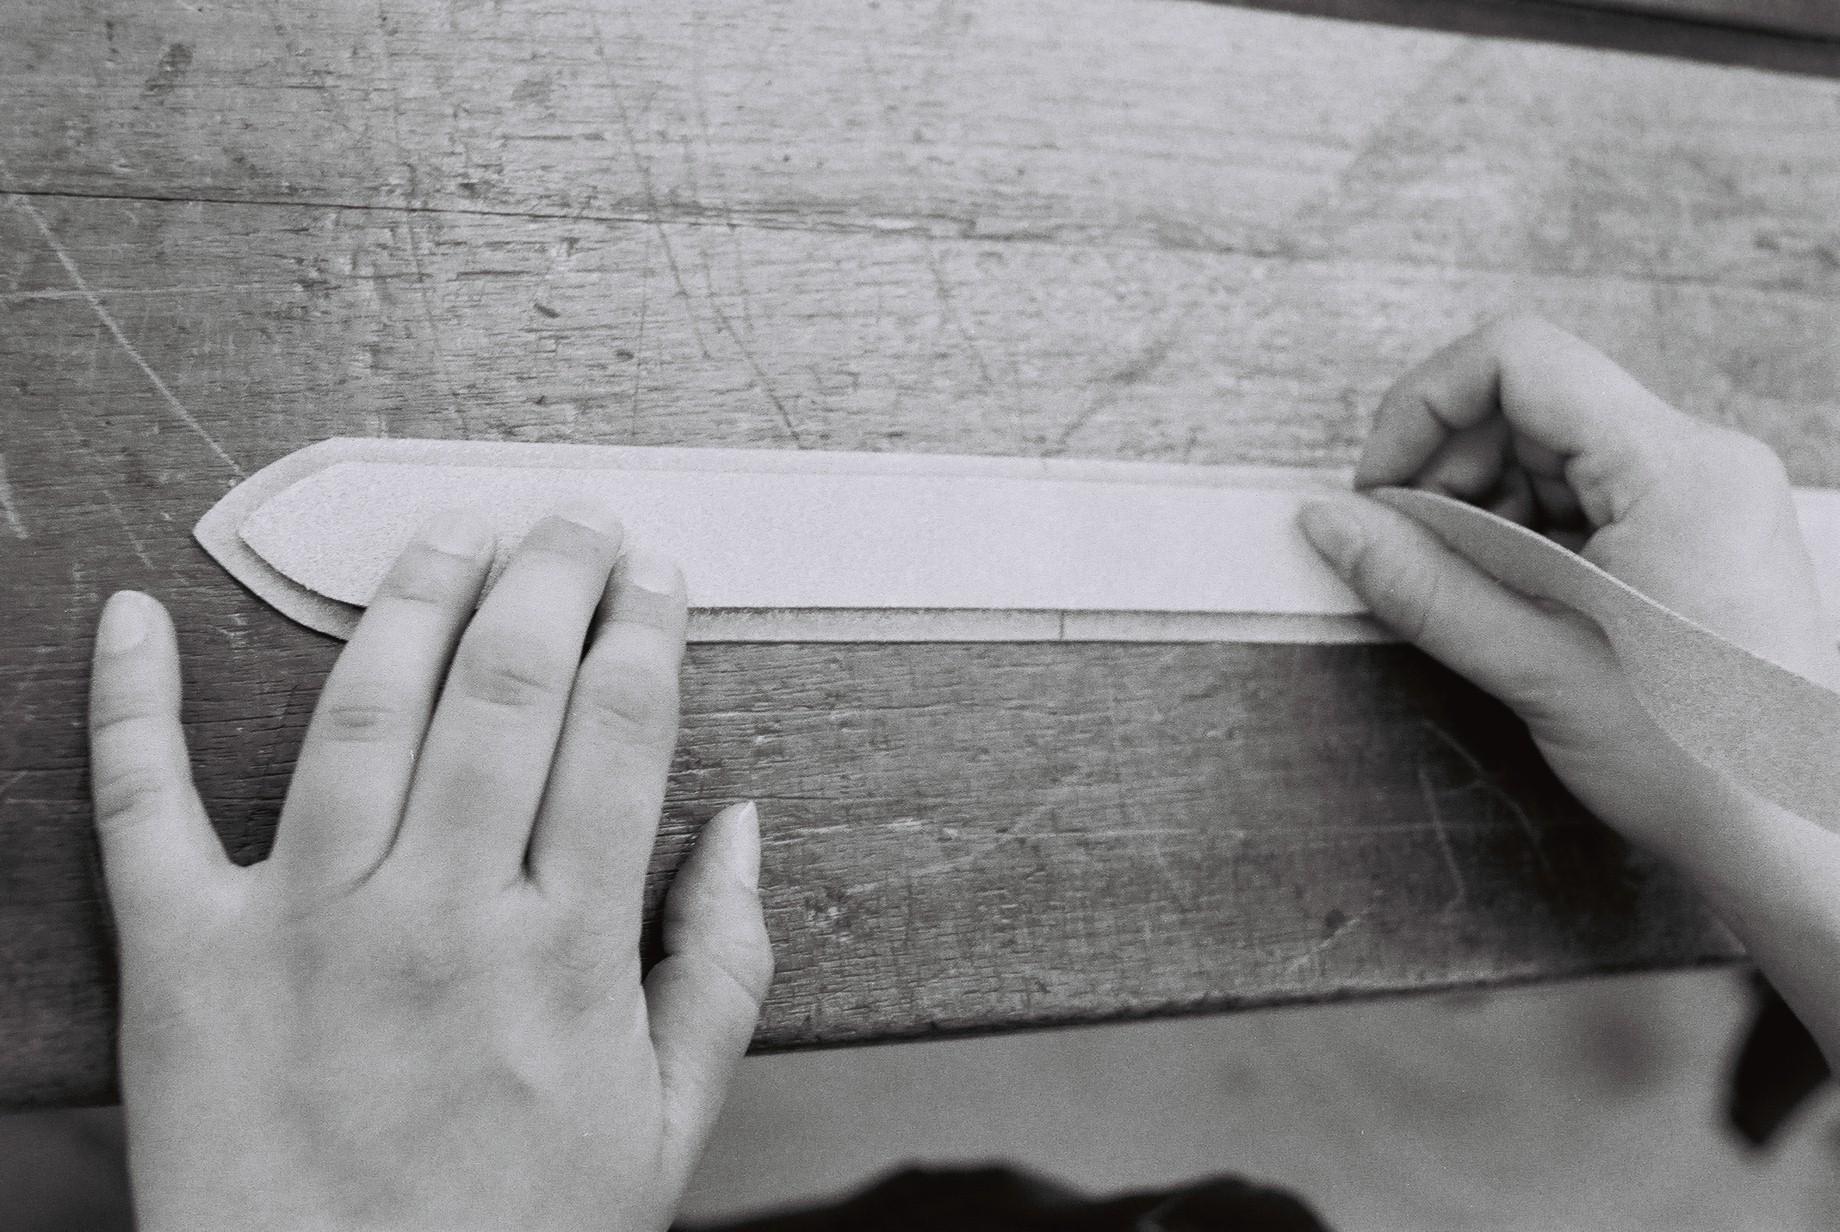 Artling_Ceinture sur mesure_Processus de fabrication_5